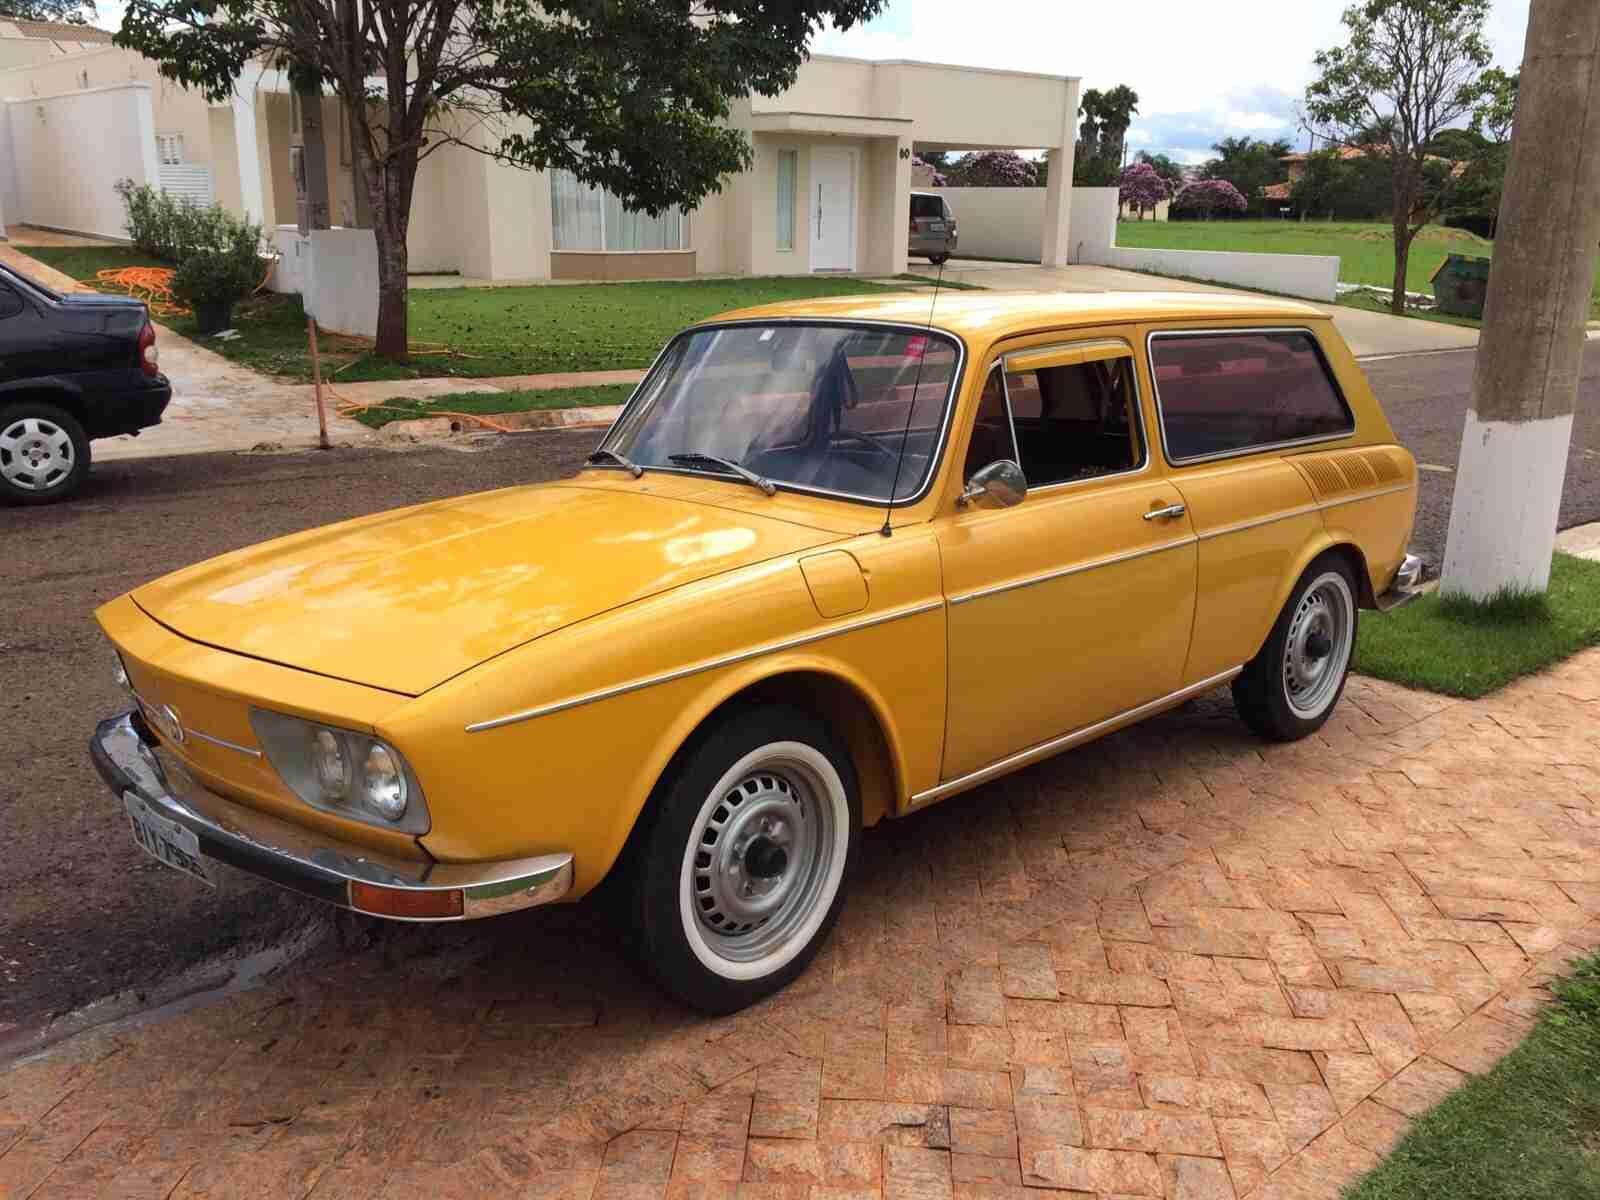 Best Carros Antigos Brasil Images On Pinterest Old Cars